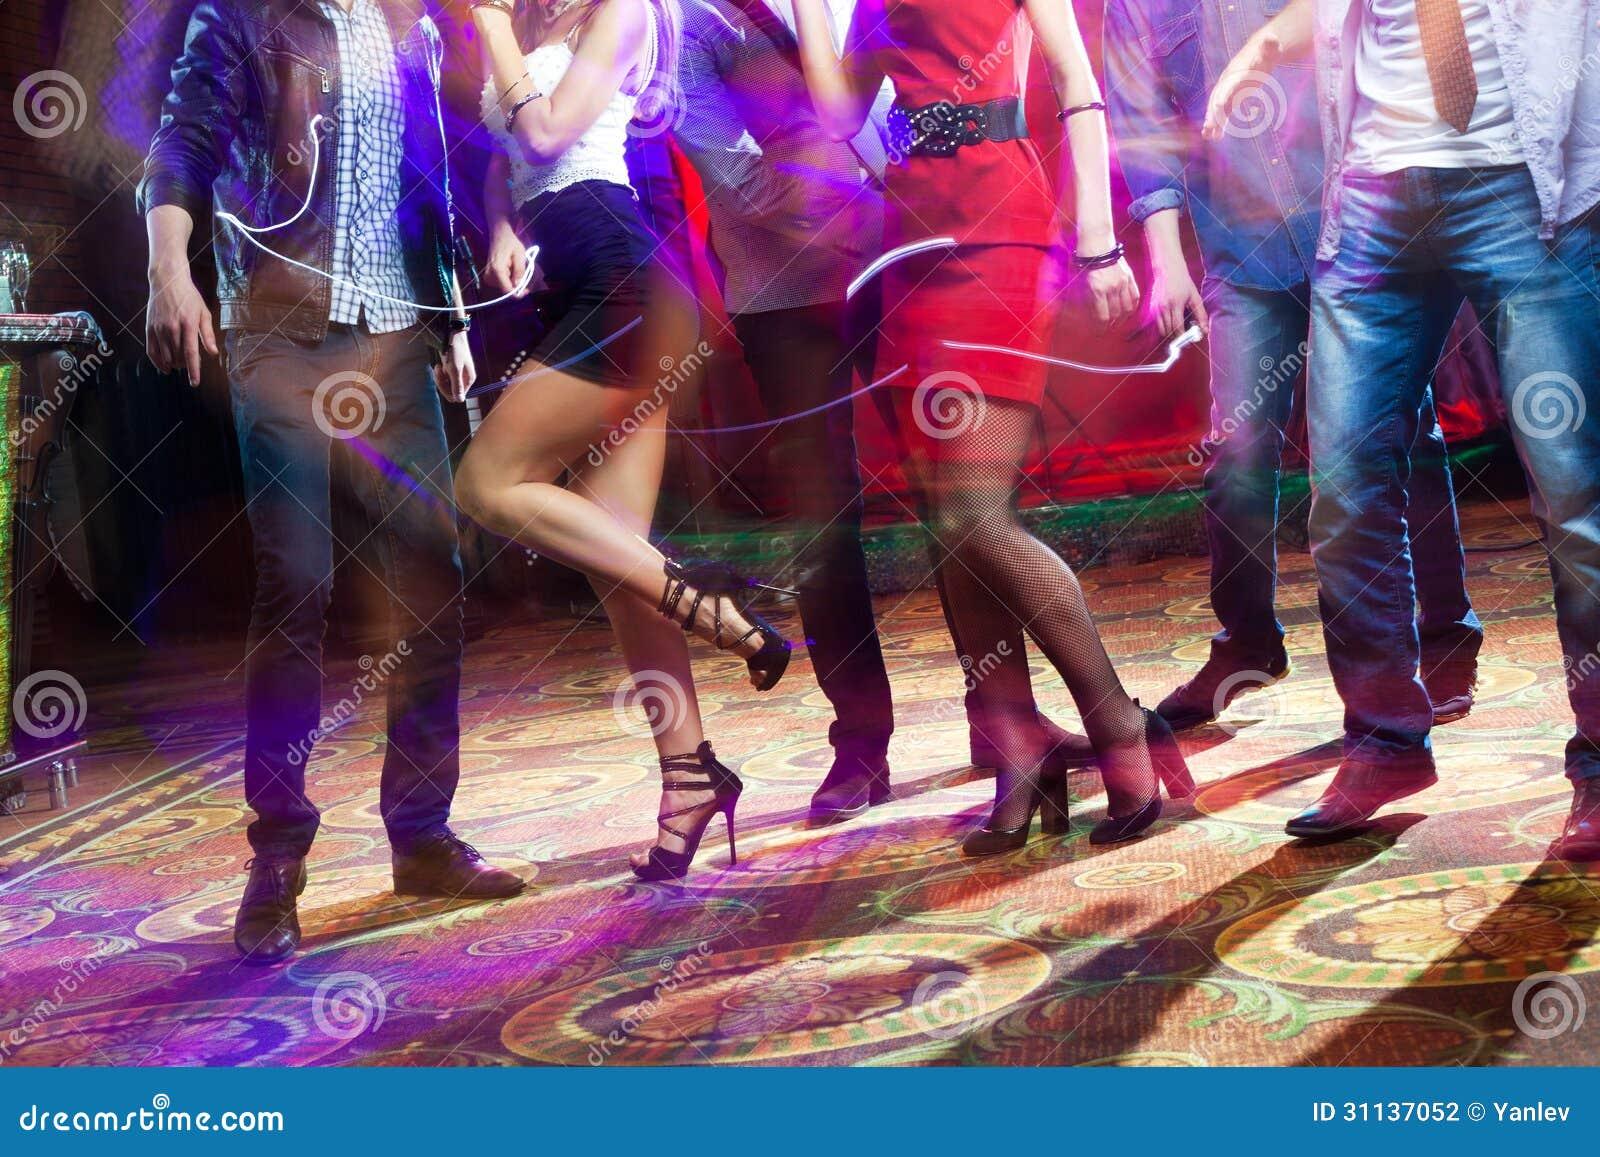 video hot orgy continue in dance nightclub